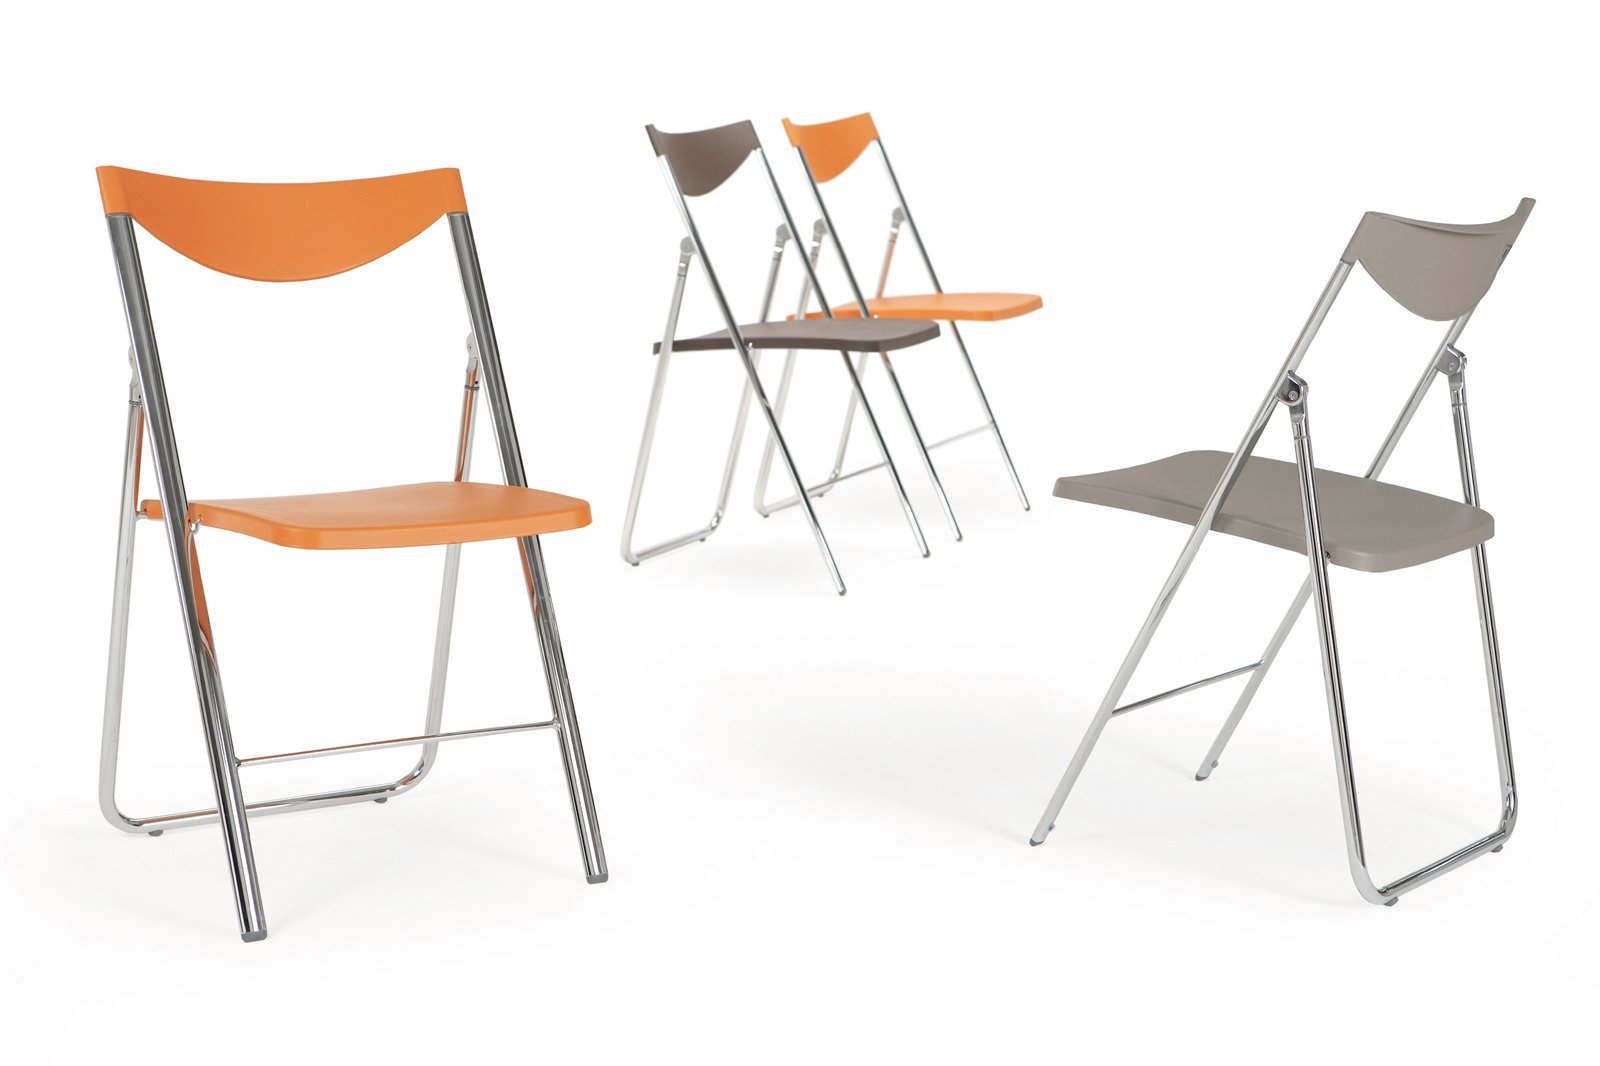 Ricerche correlate a ikea sedie pieghevoli trasparenti